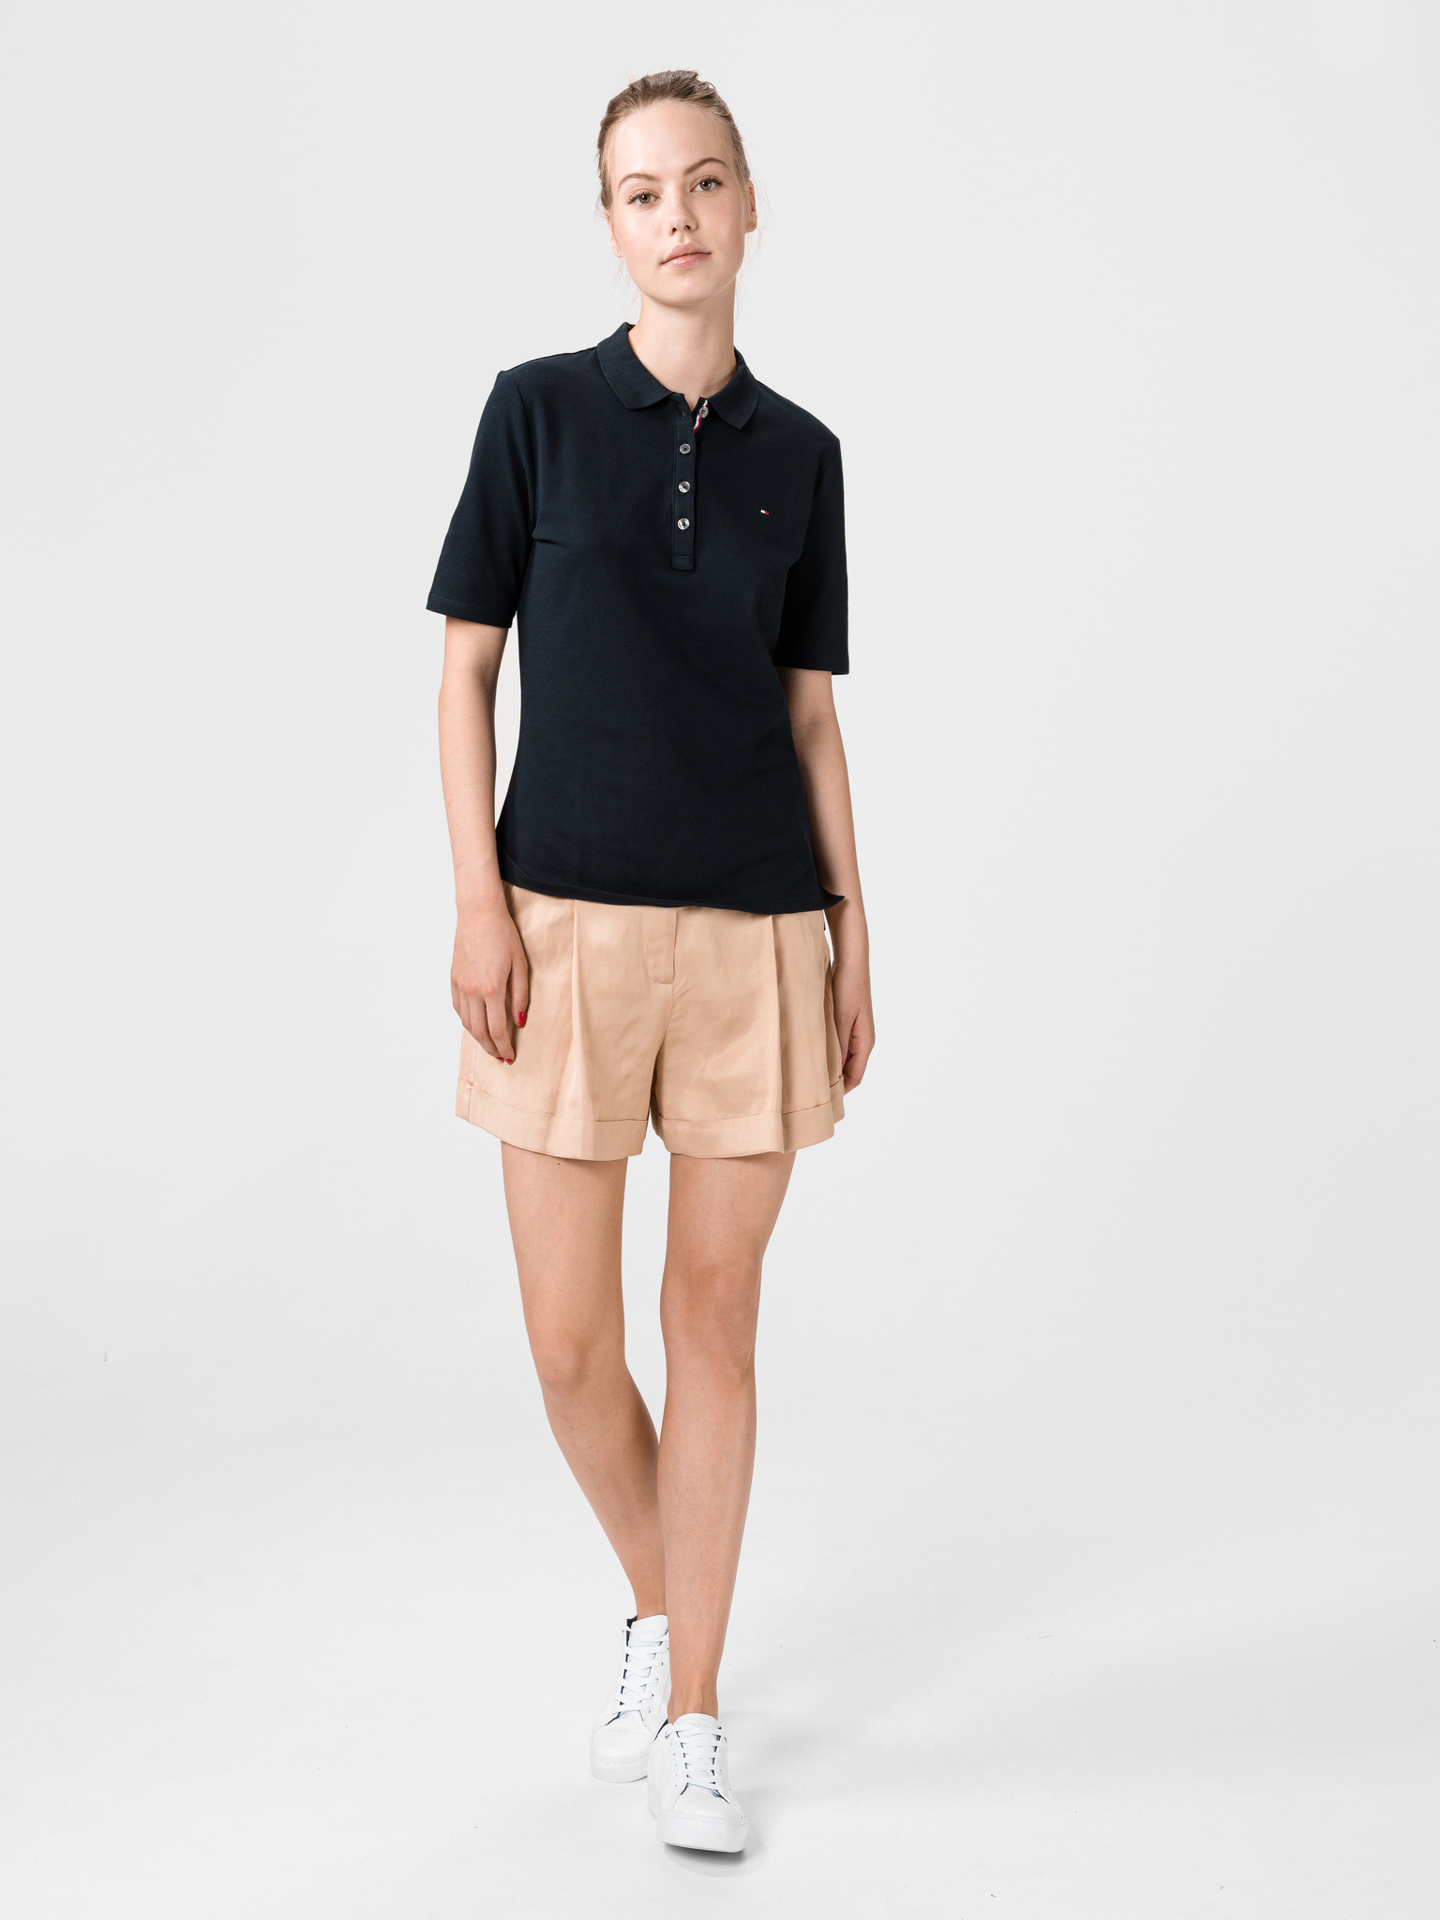 Tommy Hilfiger blu da donna maglietta Essential Polo